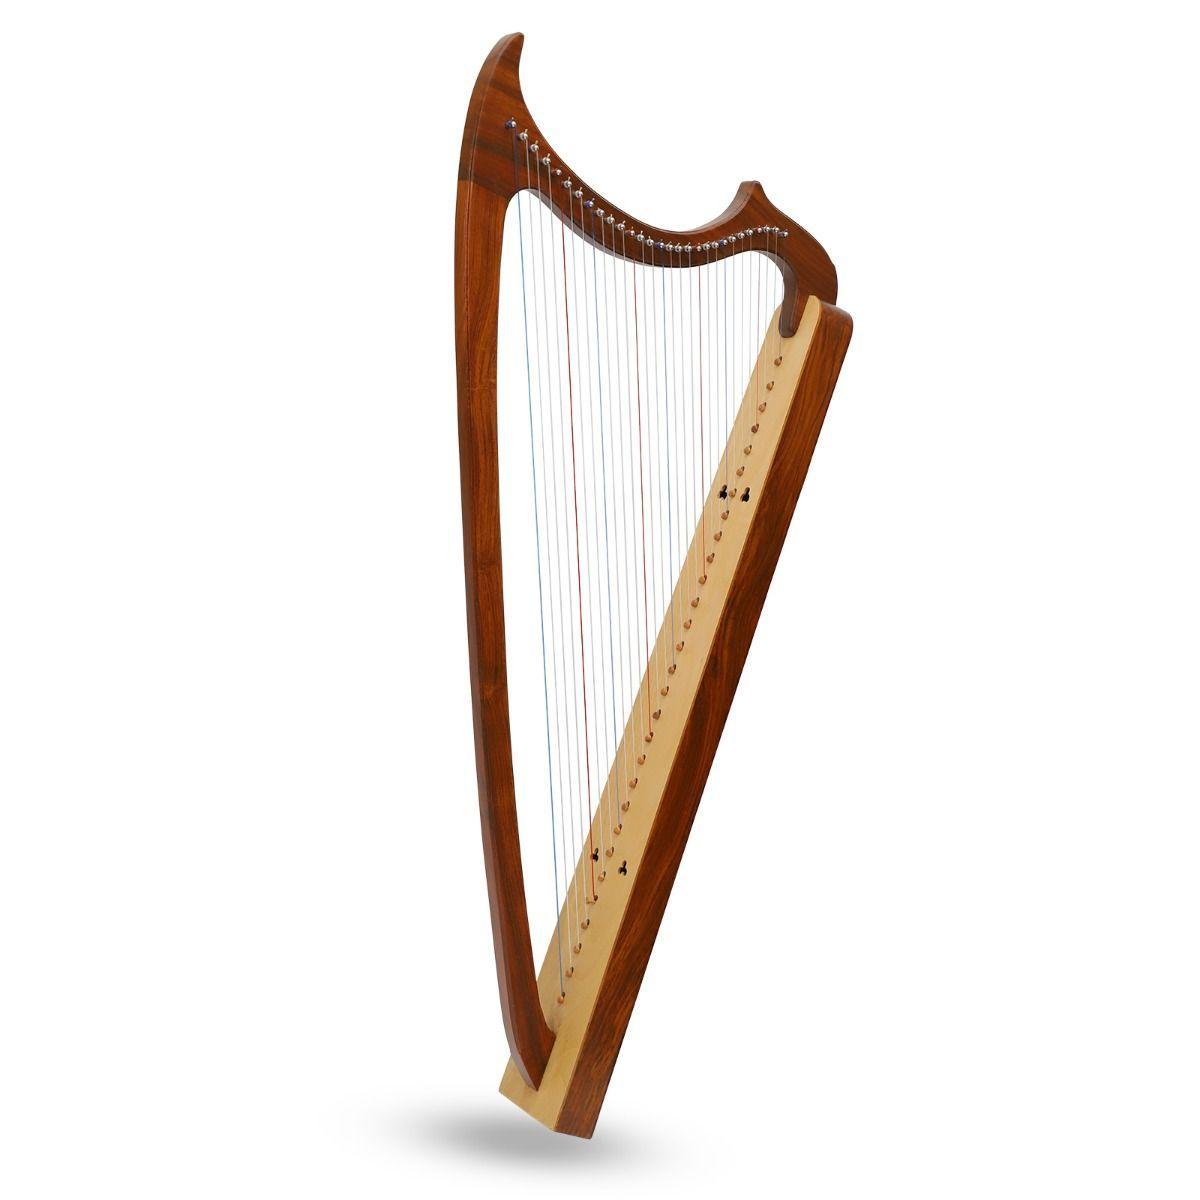 Gothic Harps